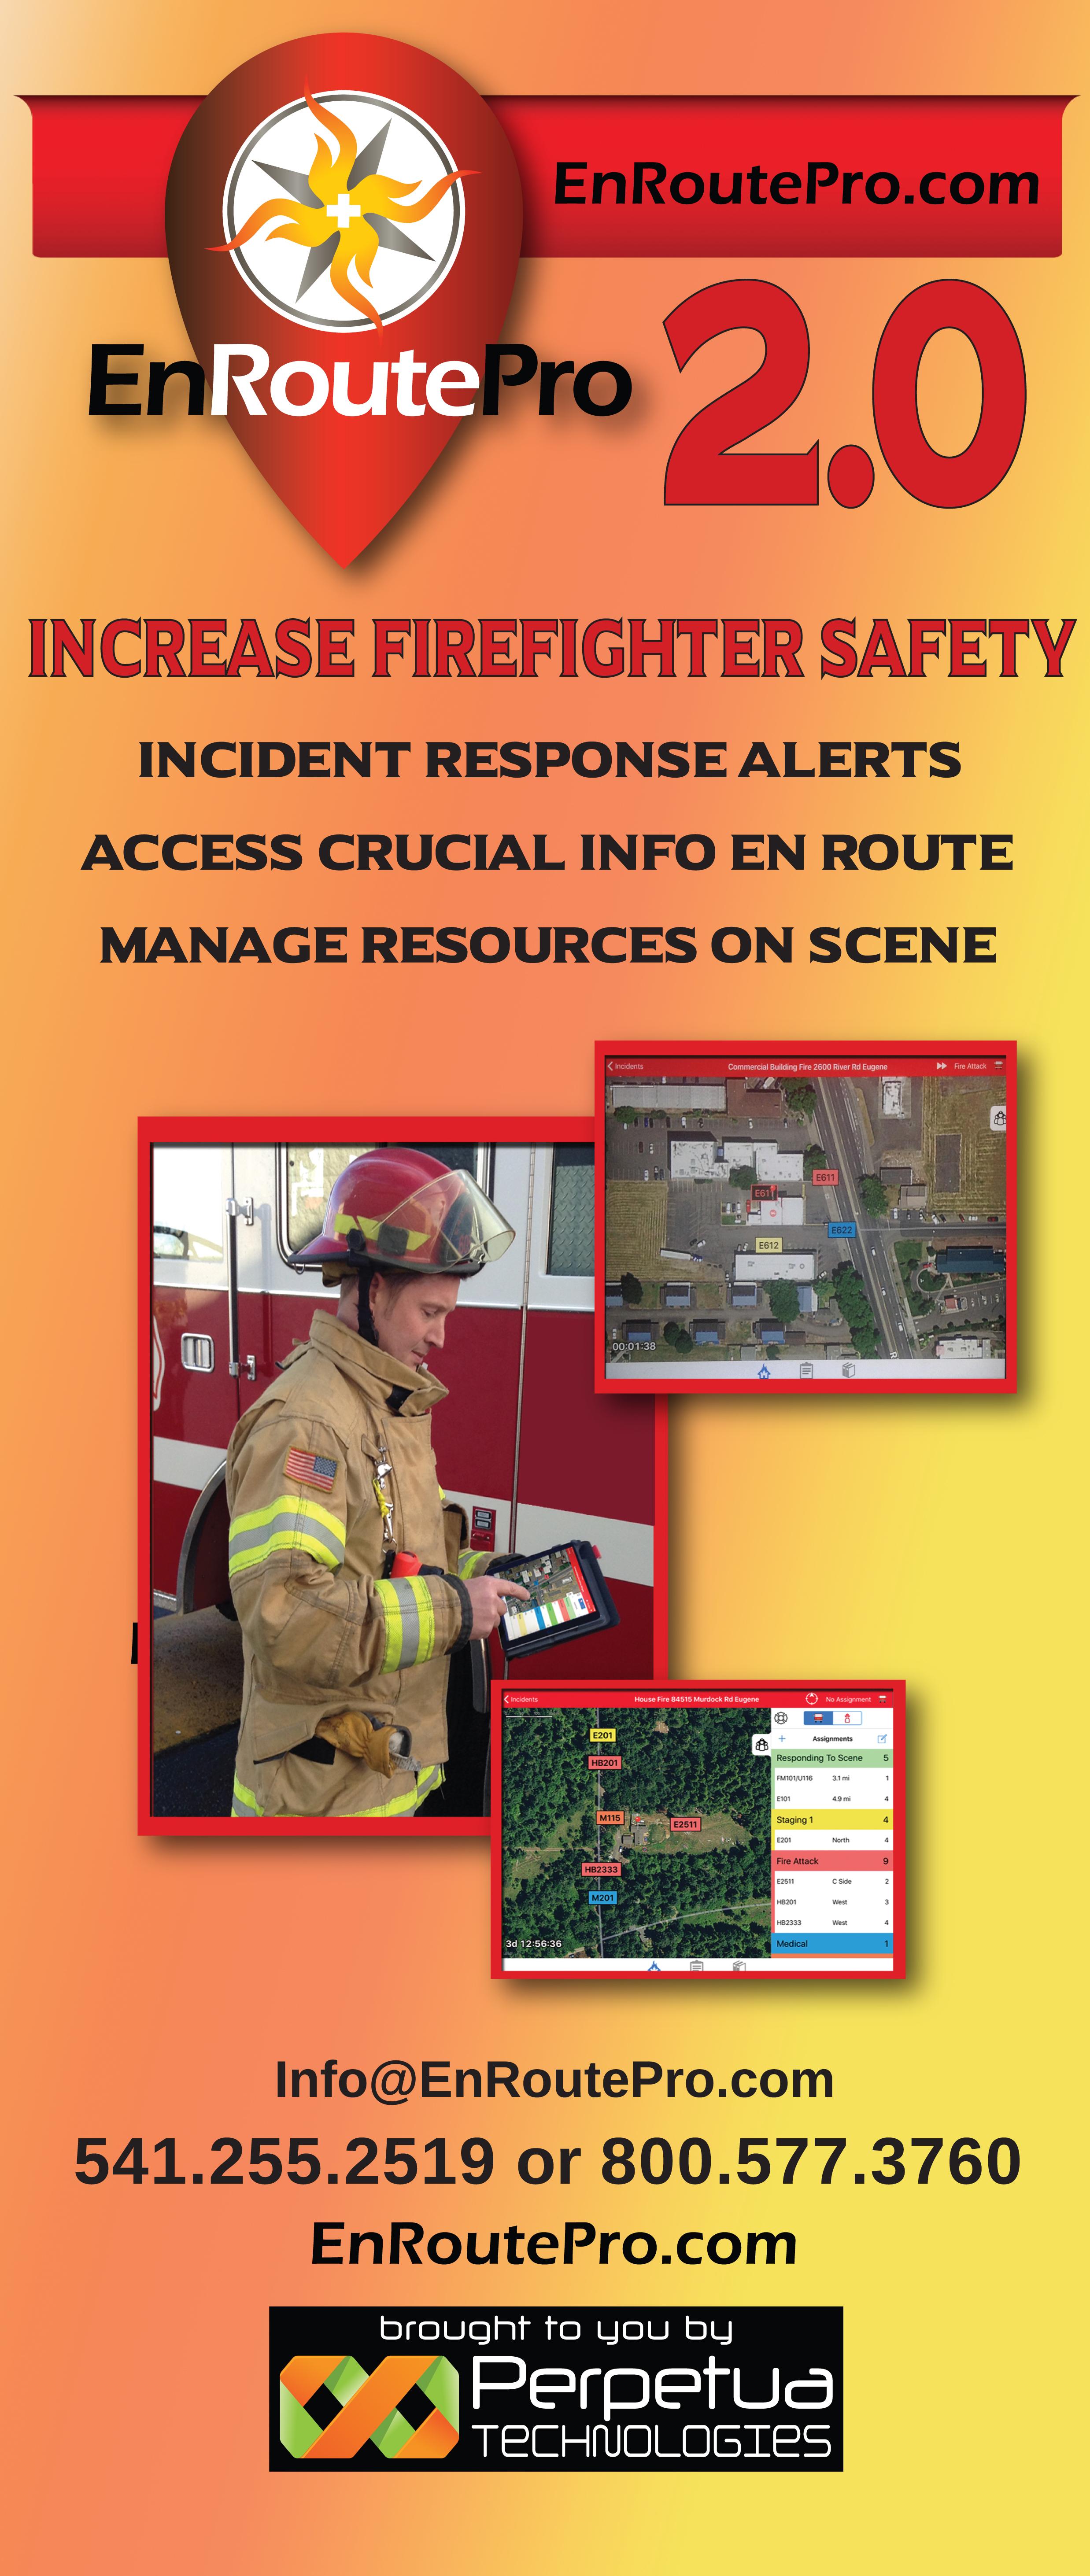 First Responder safety, on scene management